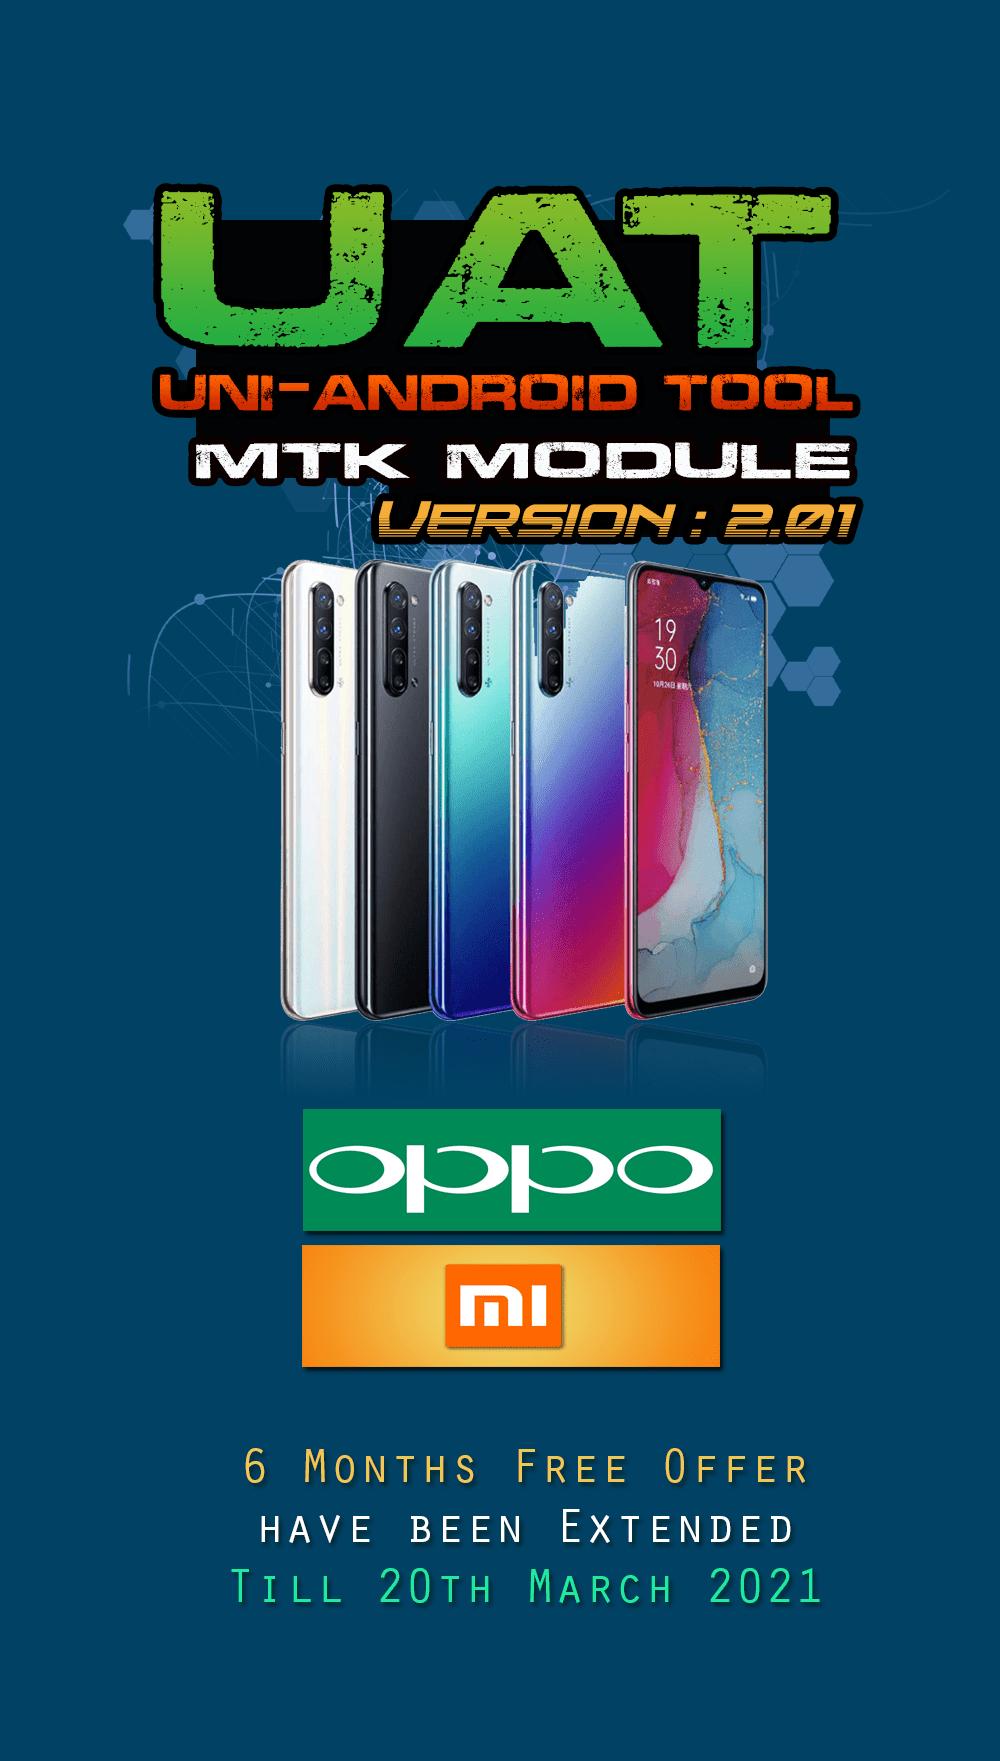 Uni-Android Tool UAT MTK Module Ver. 2.01 [28th Feb. 2021]